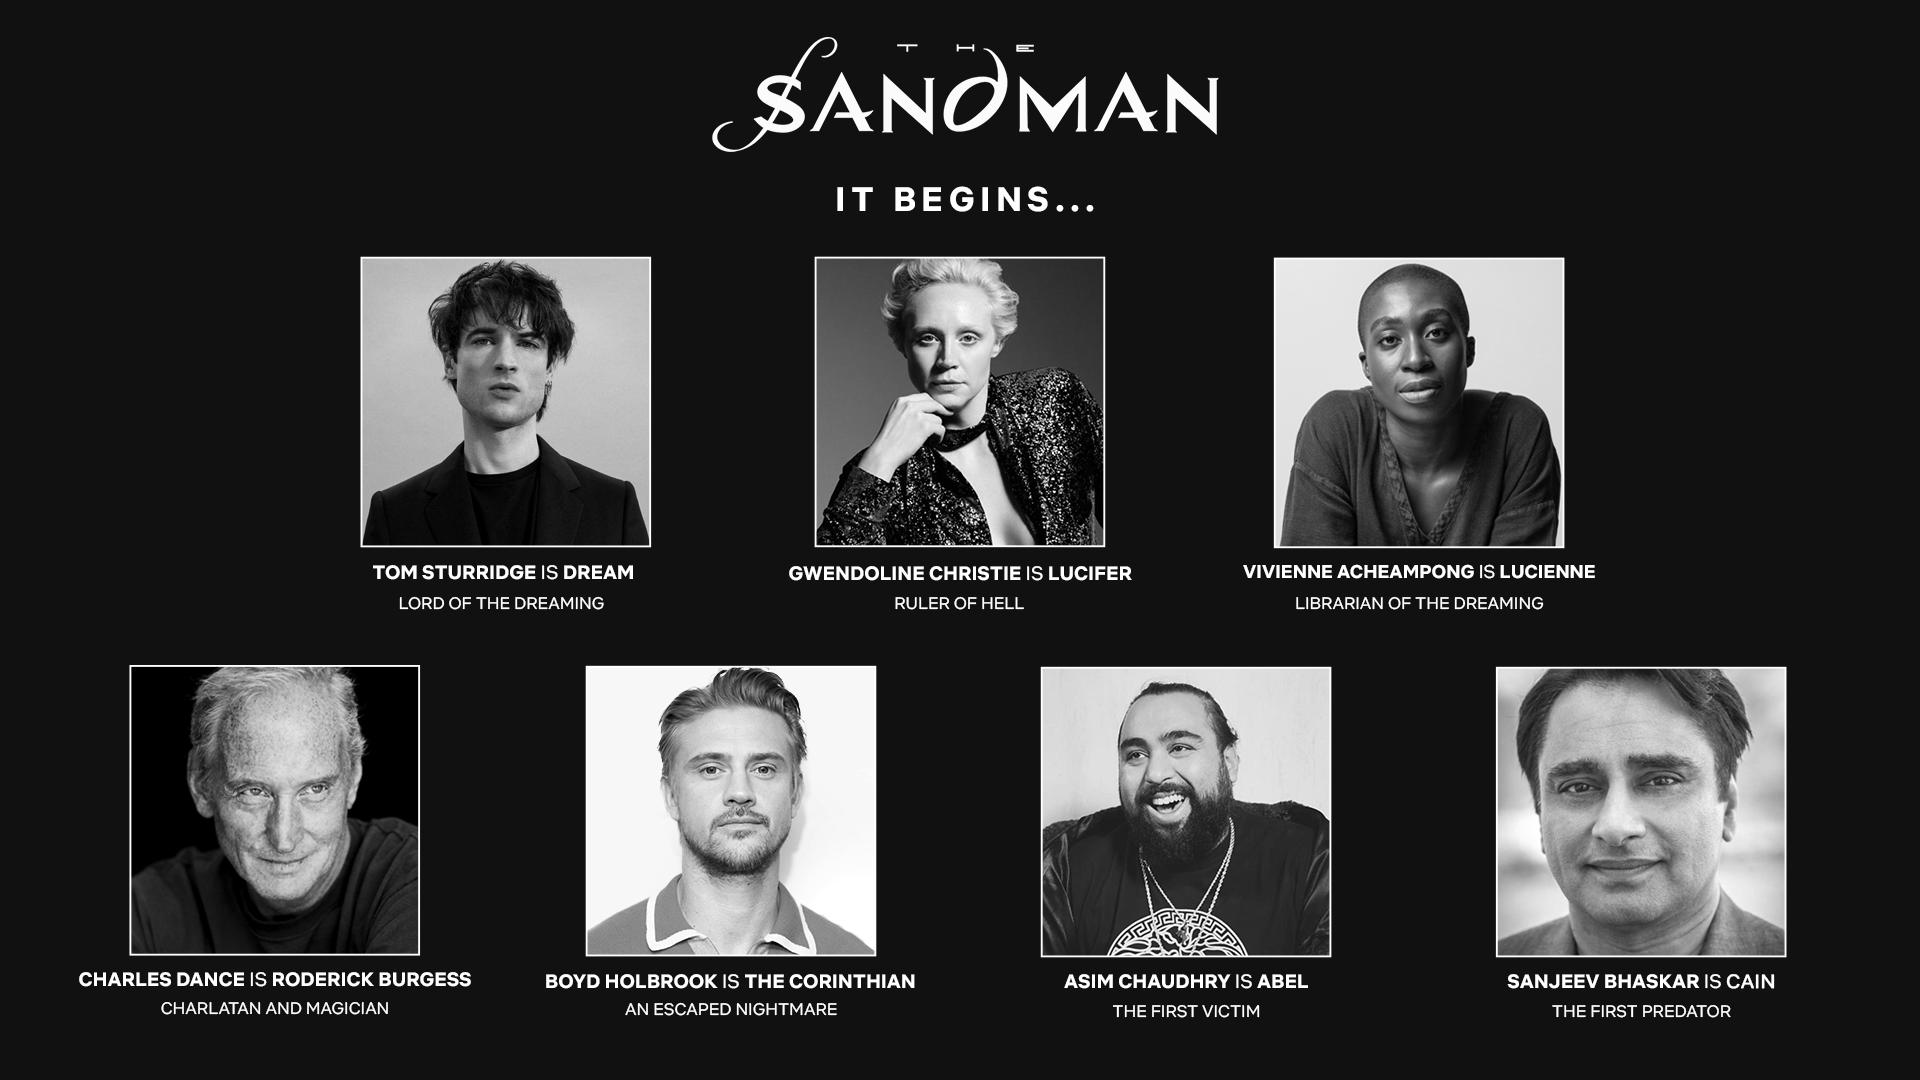 Sandman' Netflix Series Sets Main Cast, With Tom Sturridge to Star - Variety